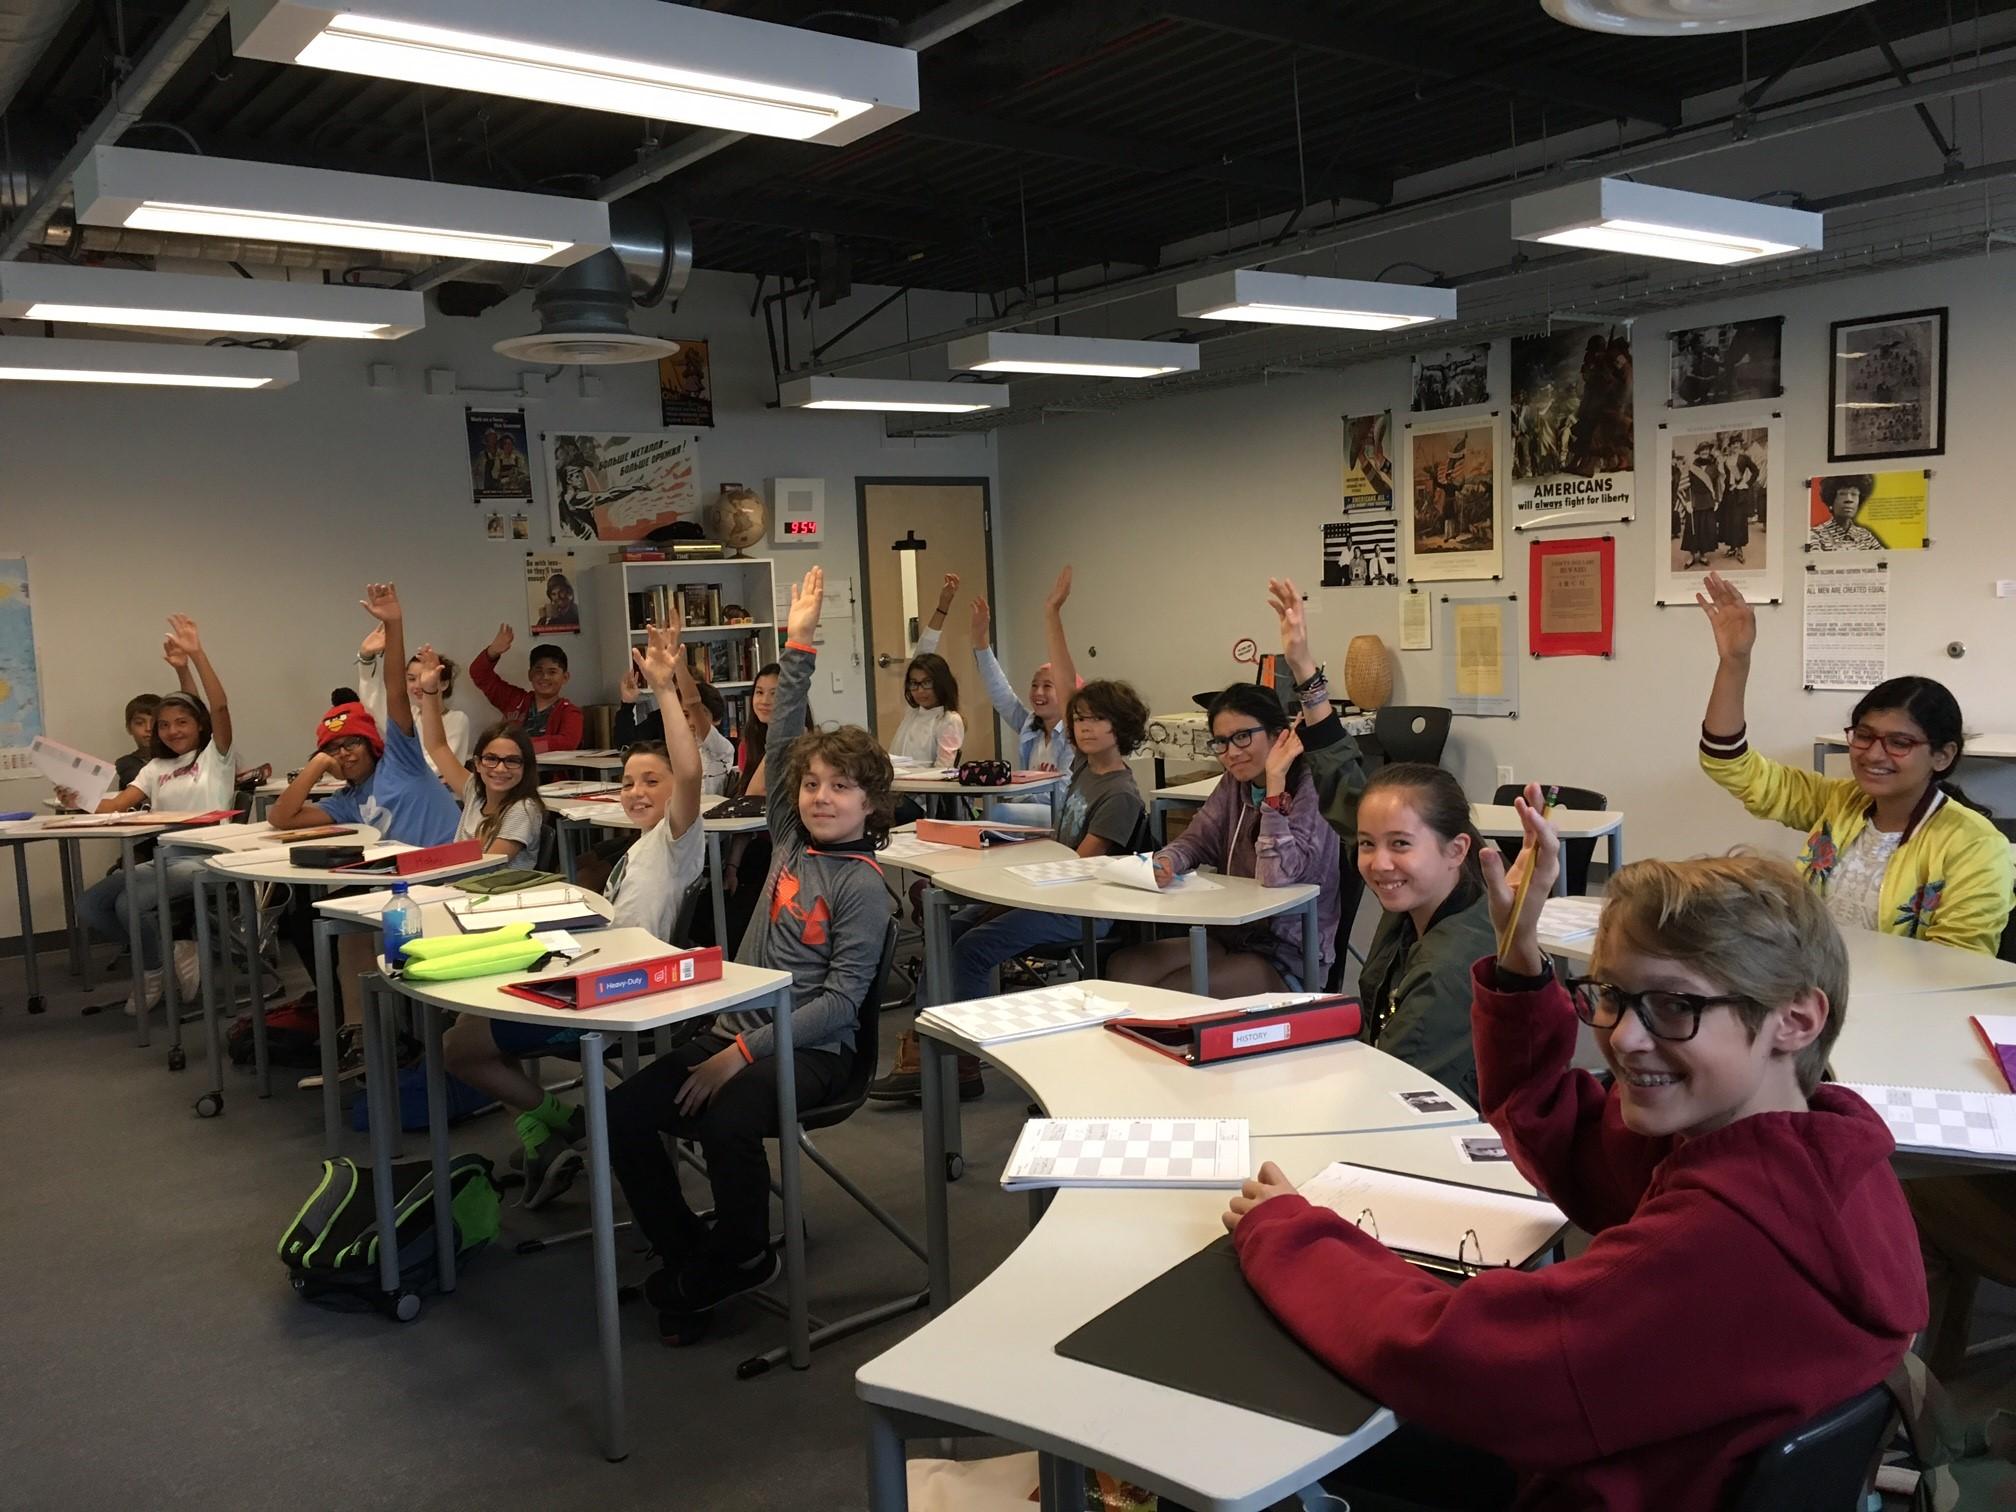 goldman history class excitement-3.jpg